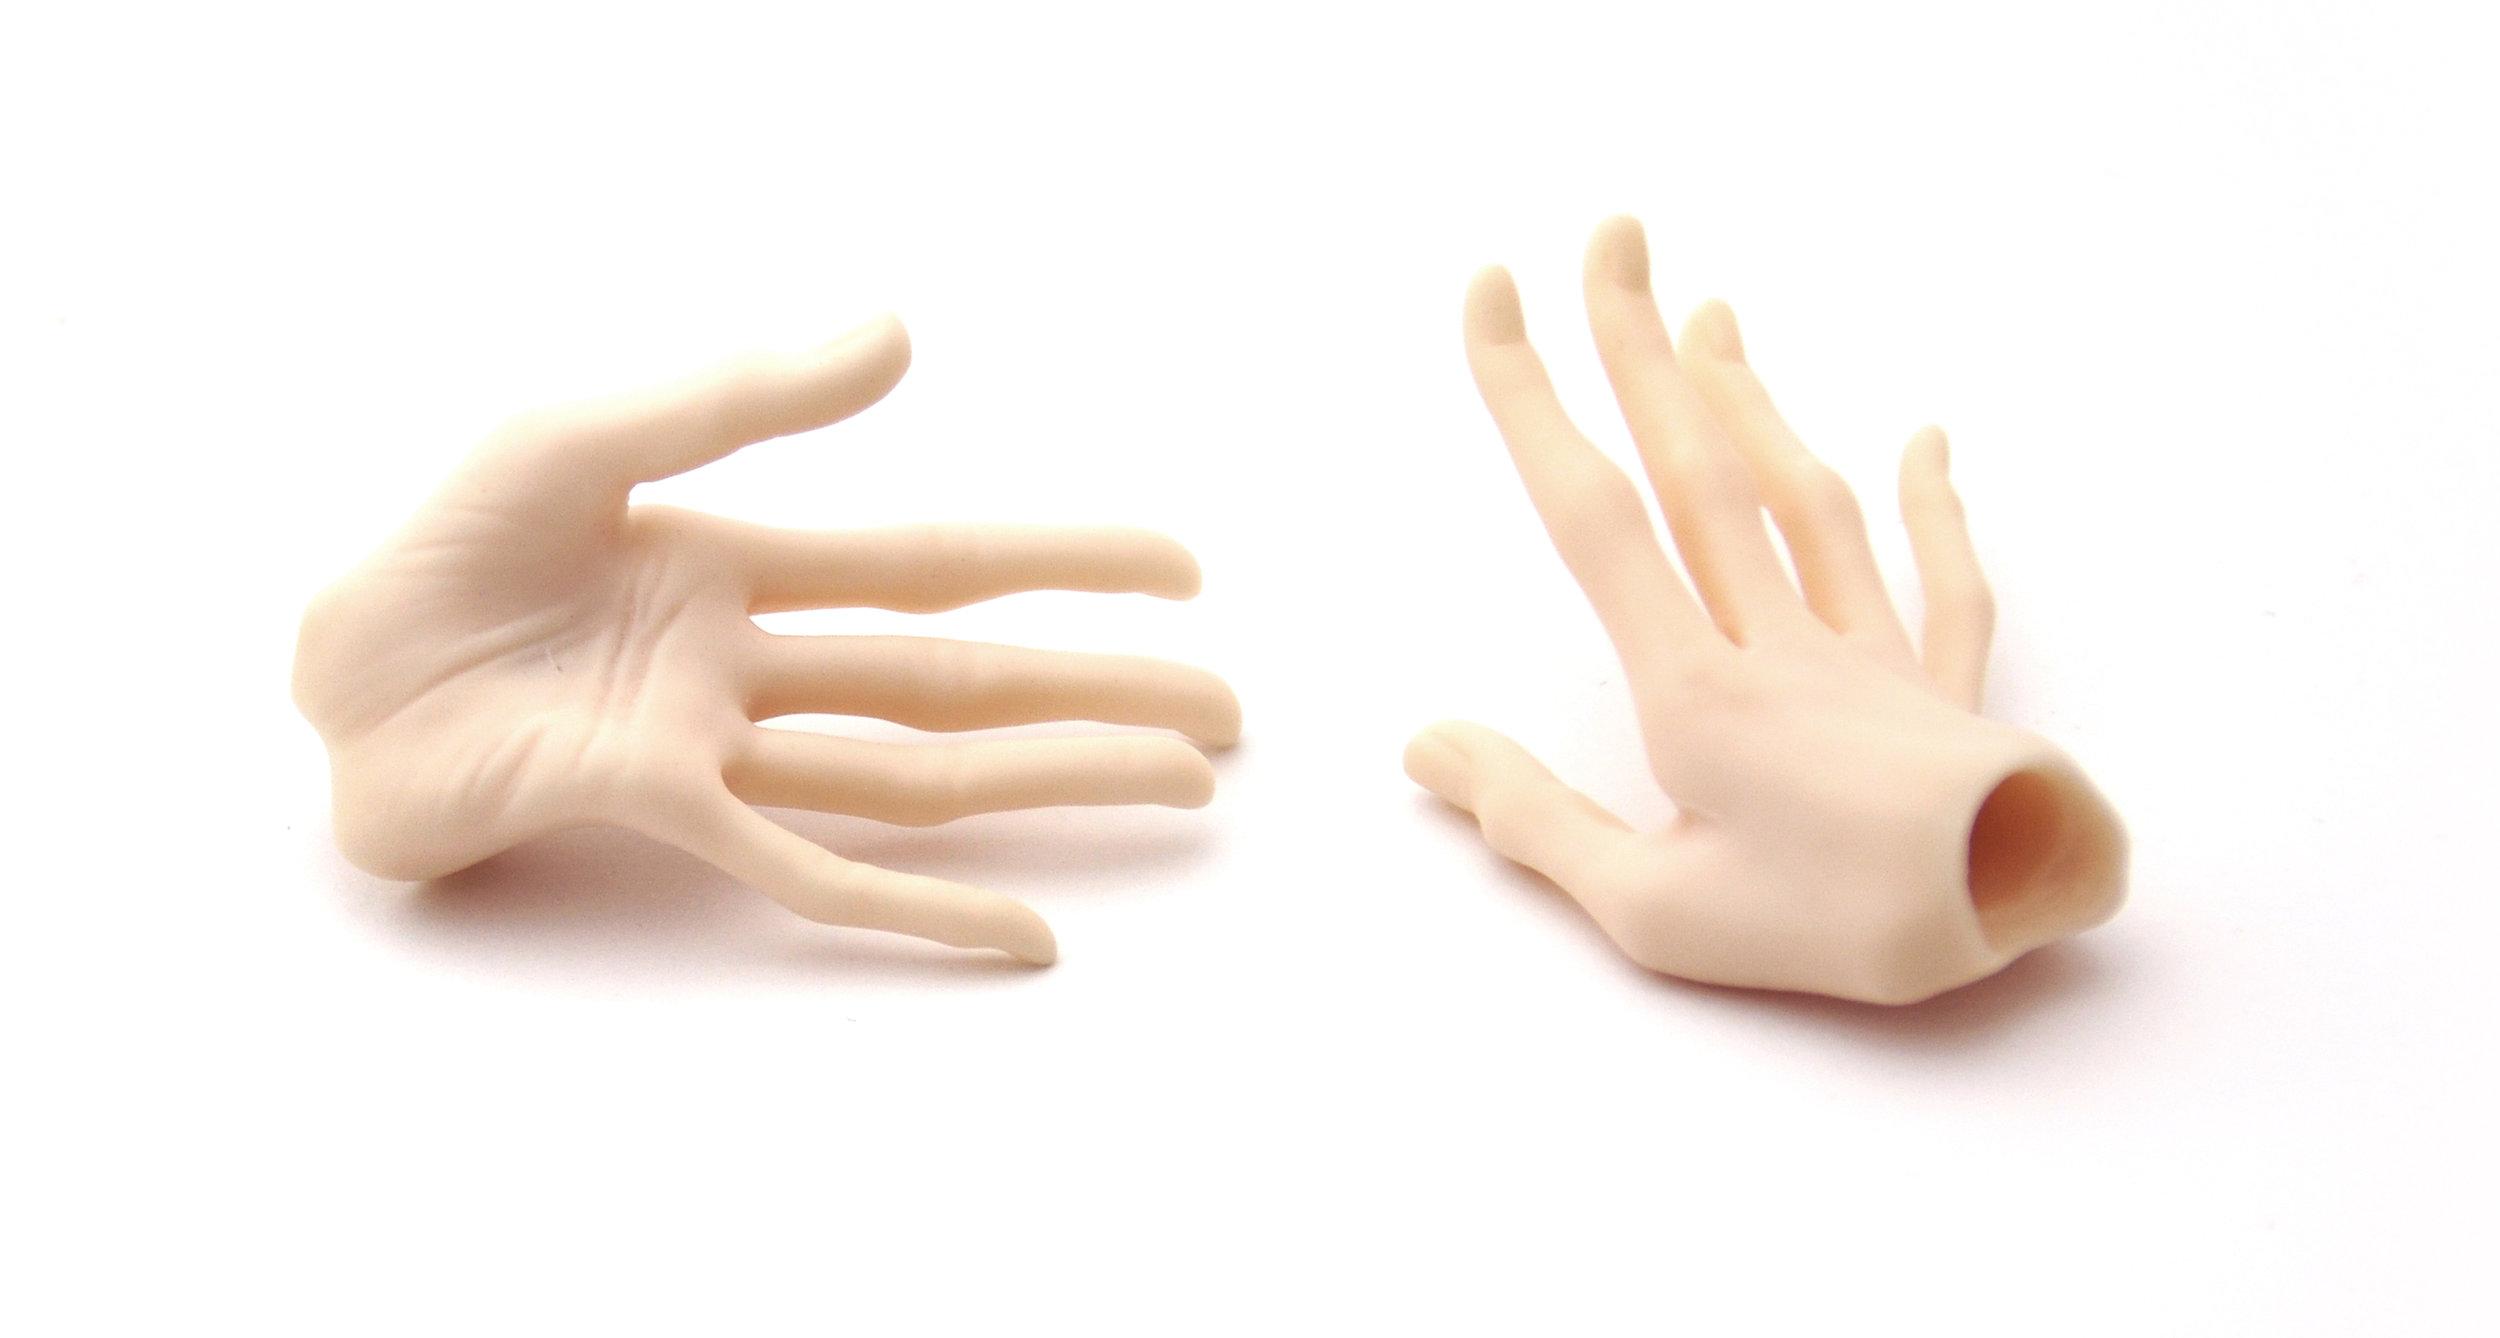 Standard Hands